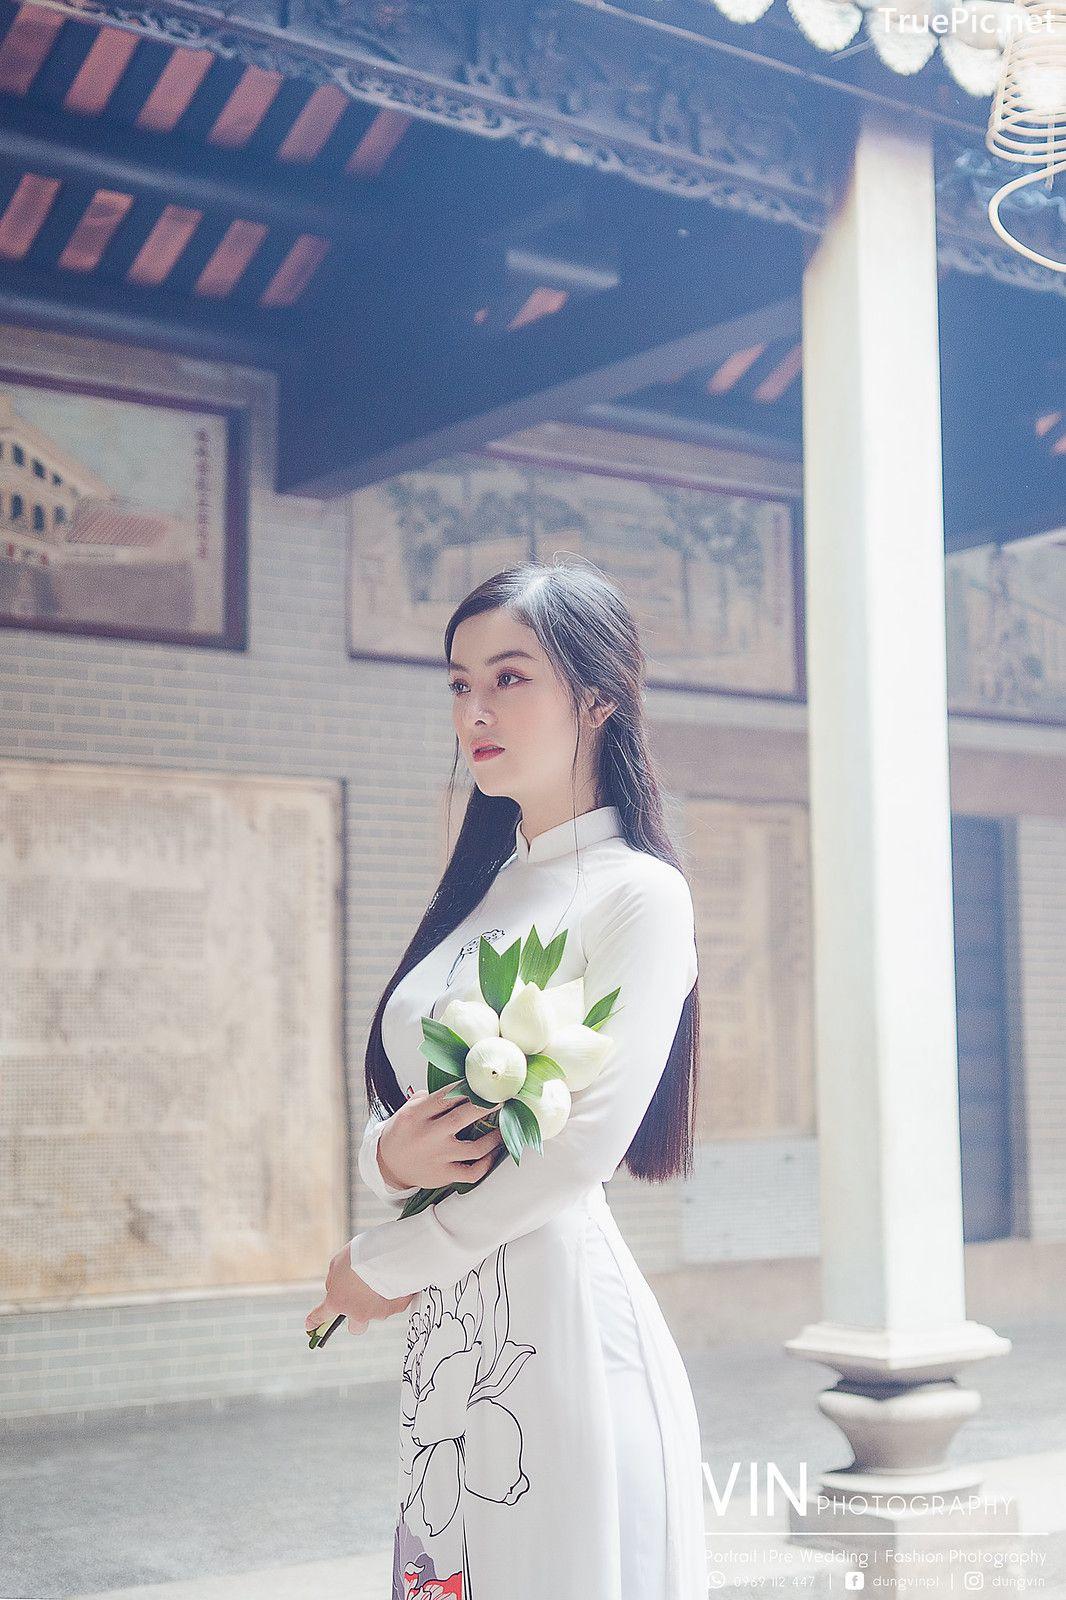 Image-Vietnamese-Beautiful-Girl-Ao-Dai-Vietnam-Traditional-Dress-by-VIN-Photo-1-TruePic.net- Picture-10